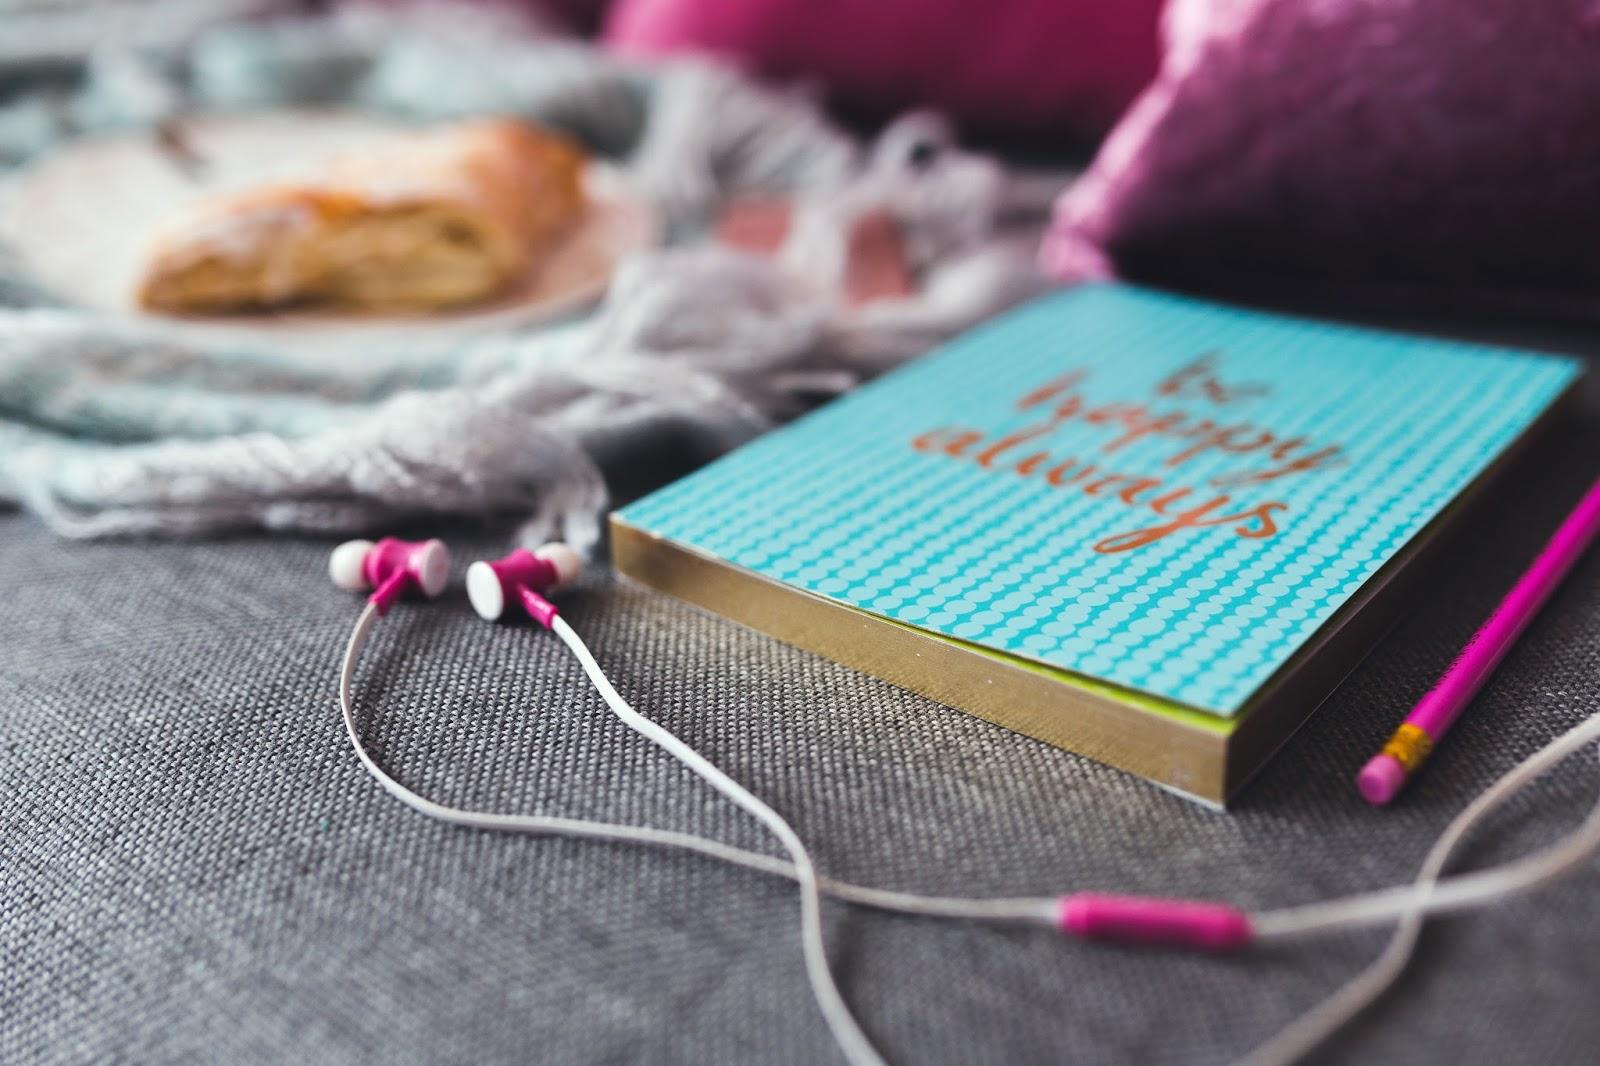 http://kaboompics.com/one_foto/1316/notebook-and-pink-earphones